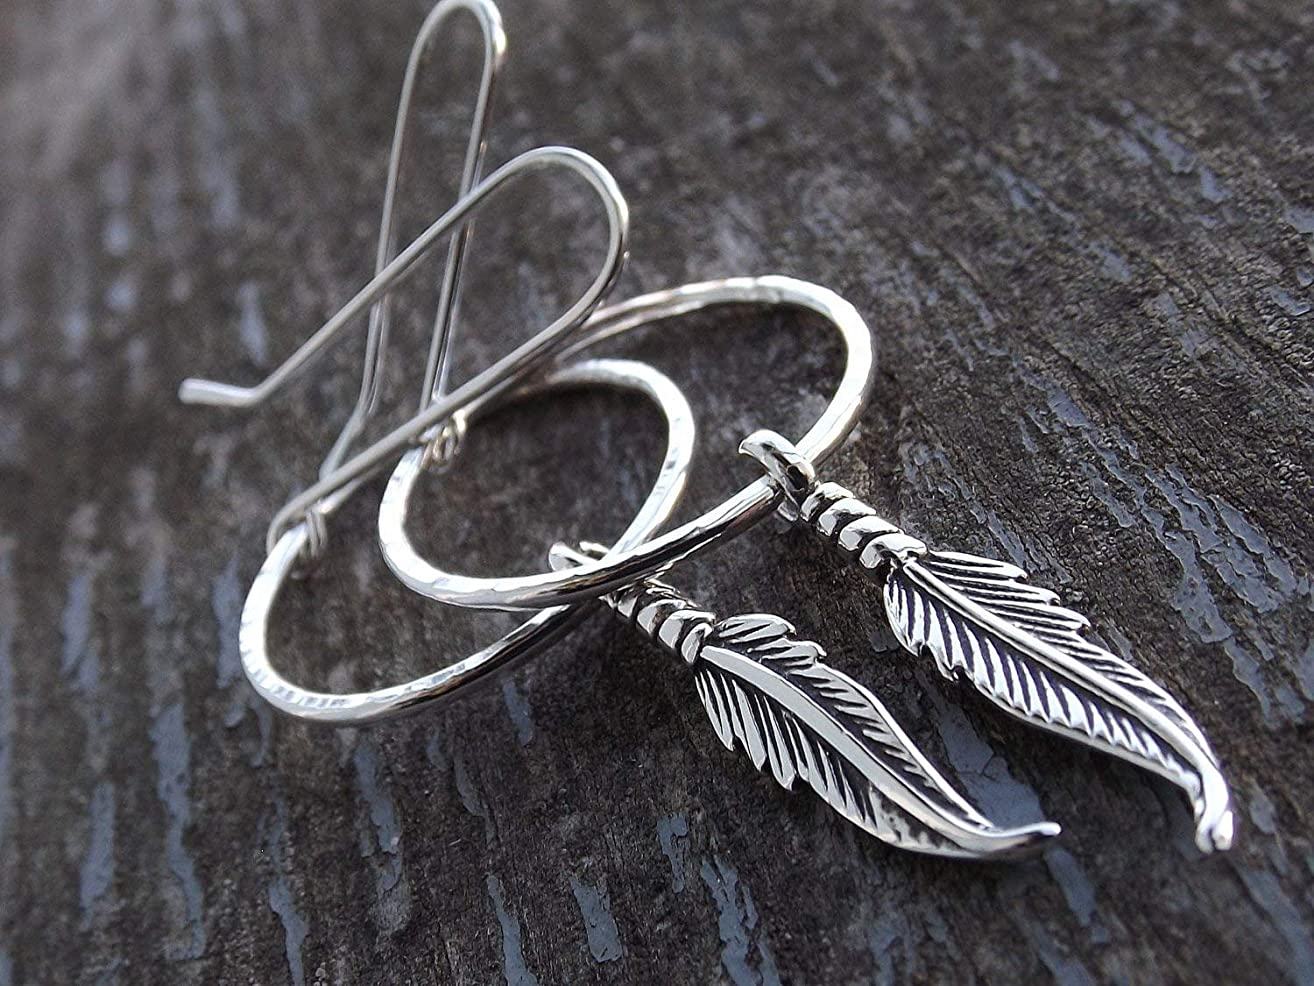 Feather Earrings, Hoop Earrigs, Long Boho Earrings, Silver Feather Earrings, Boho Earrings, Modern, Minimalist, Long Feather Hoop Earrings